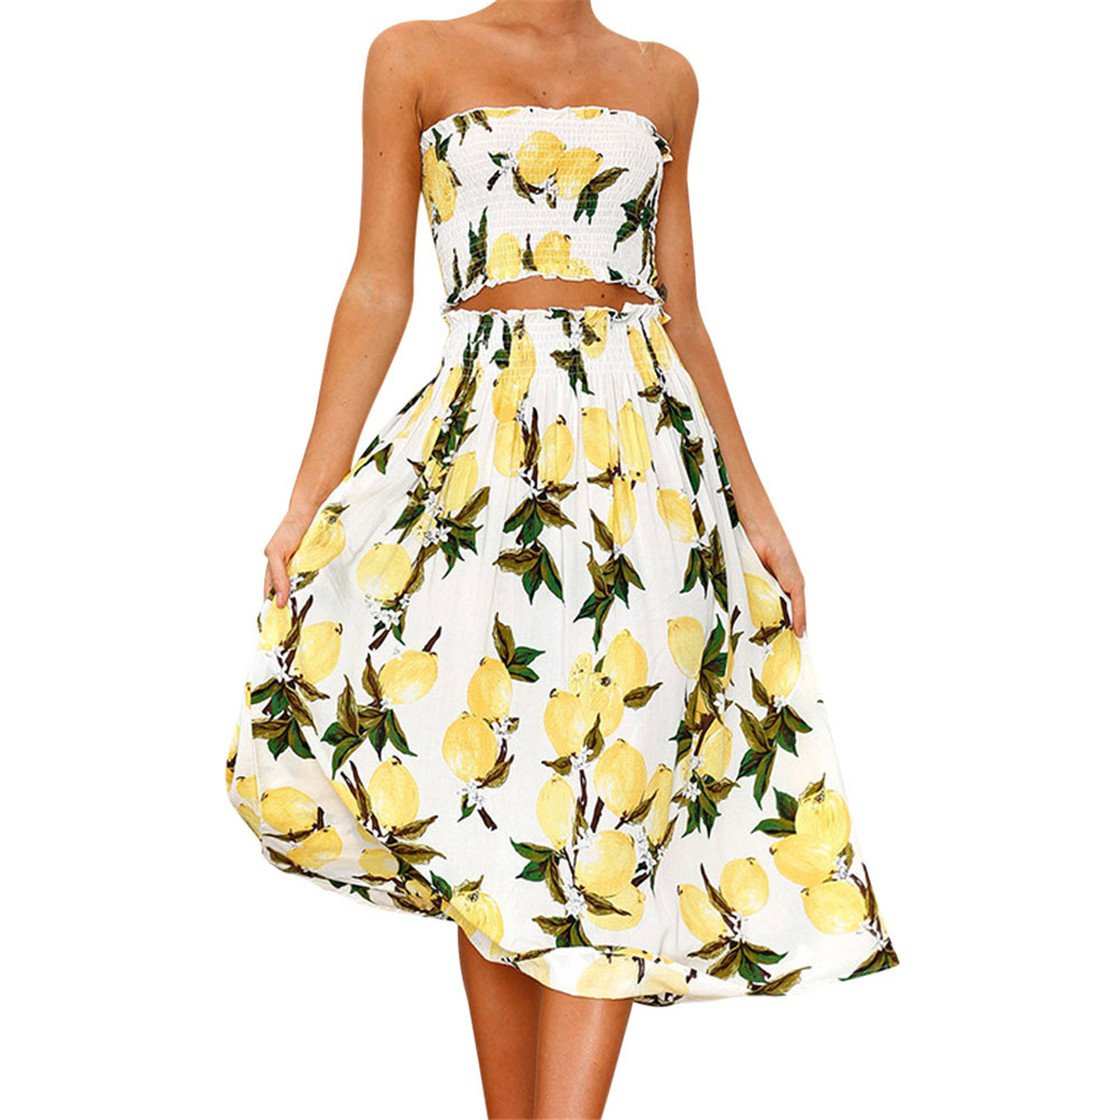 Mose Skirts for Women, Womens Lemon Print Halter Two Piece Slash Neck Tops Casual Elegant Summer Beach Vest Shirt Blouse Set New (Yellow, S)